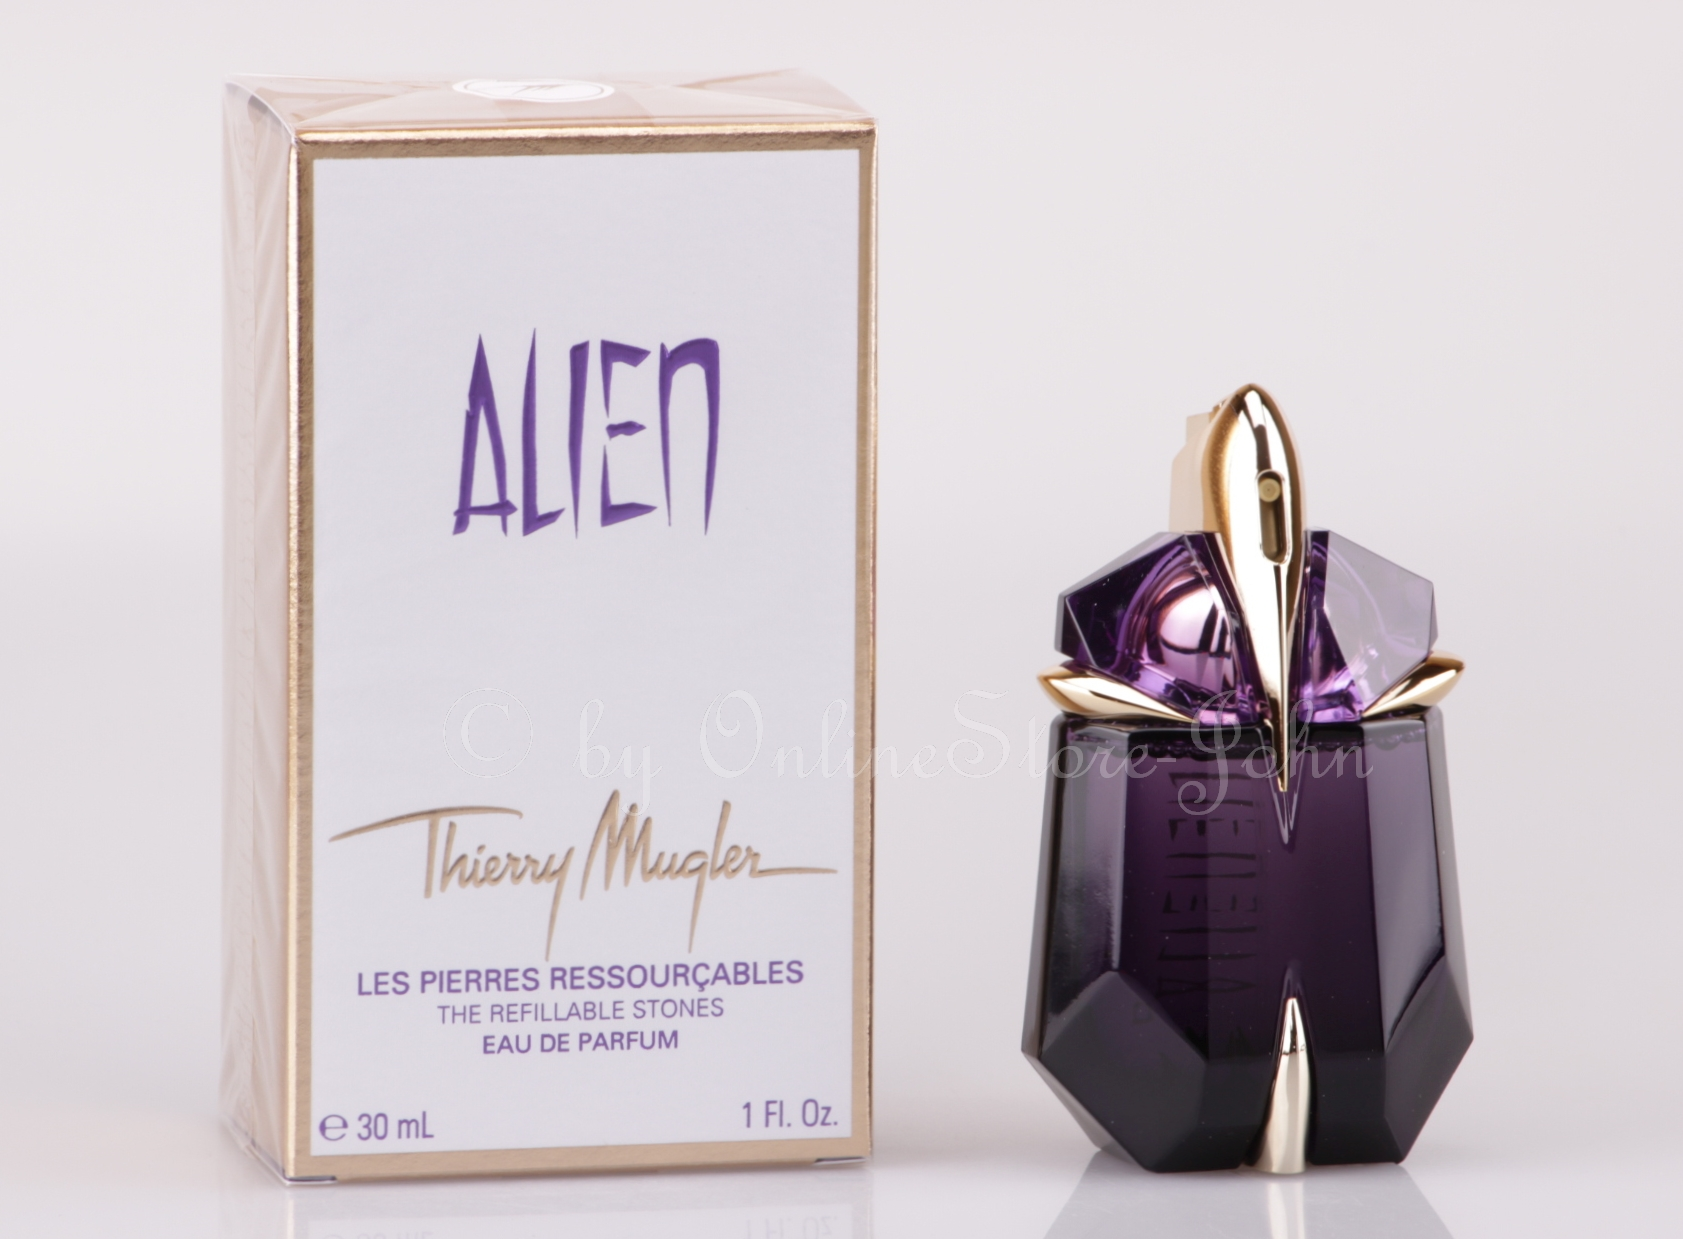 4569d7d9e Thierry Mugler - ALIEN - 30ml EDP Eau de Parfum - refillable